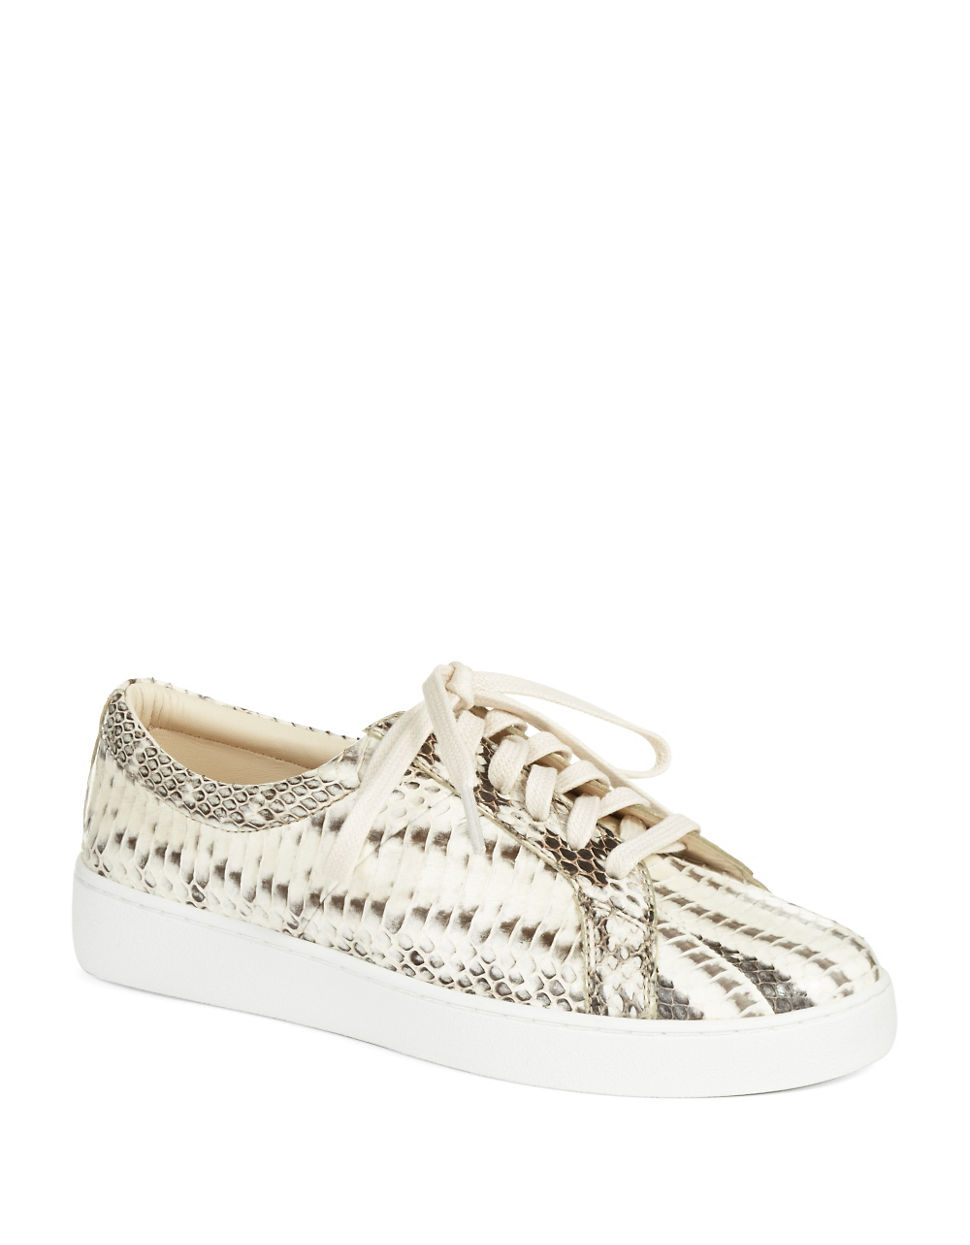 c2ce762073a michael kors snakeskin sneakers outlet store destin fl - Marwood ...